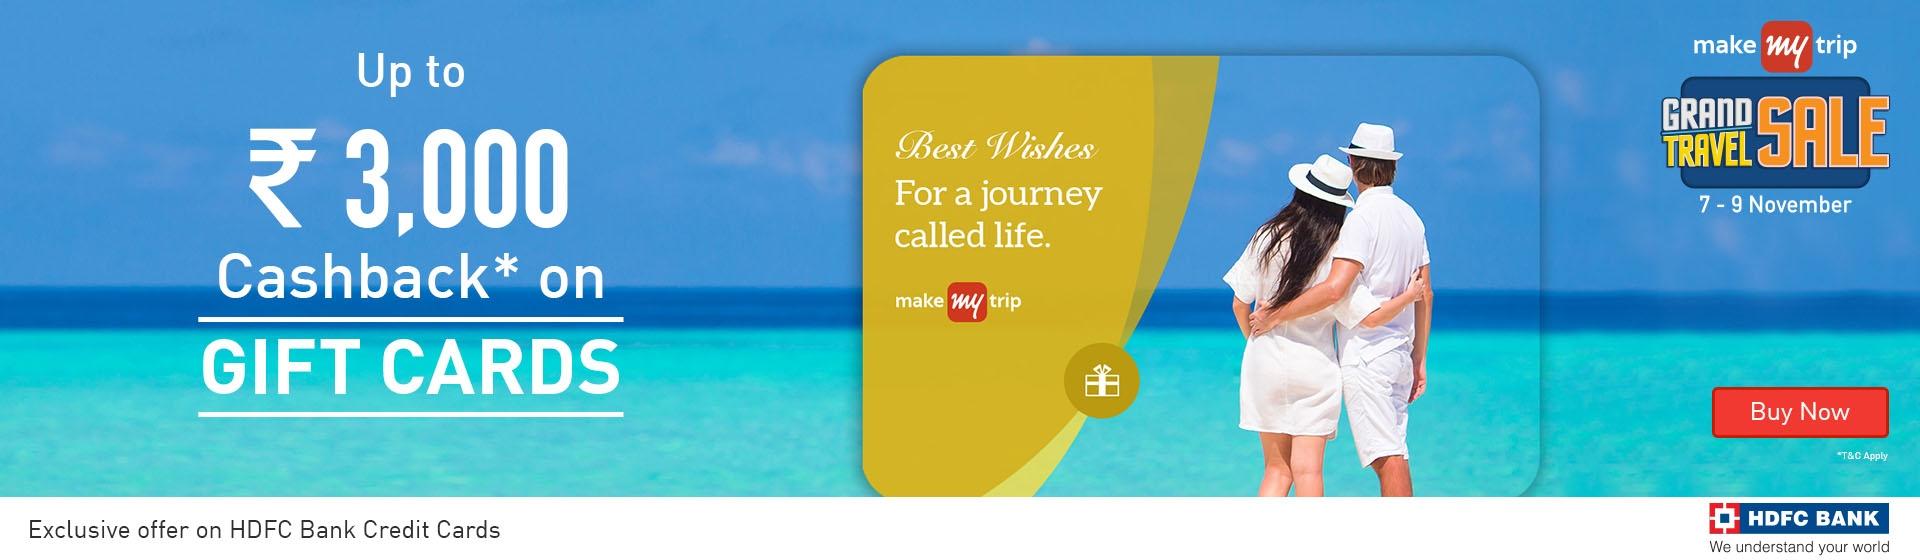 Travel Gift Certificate Template Free Mandegarfo